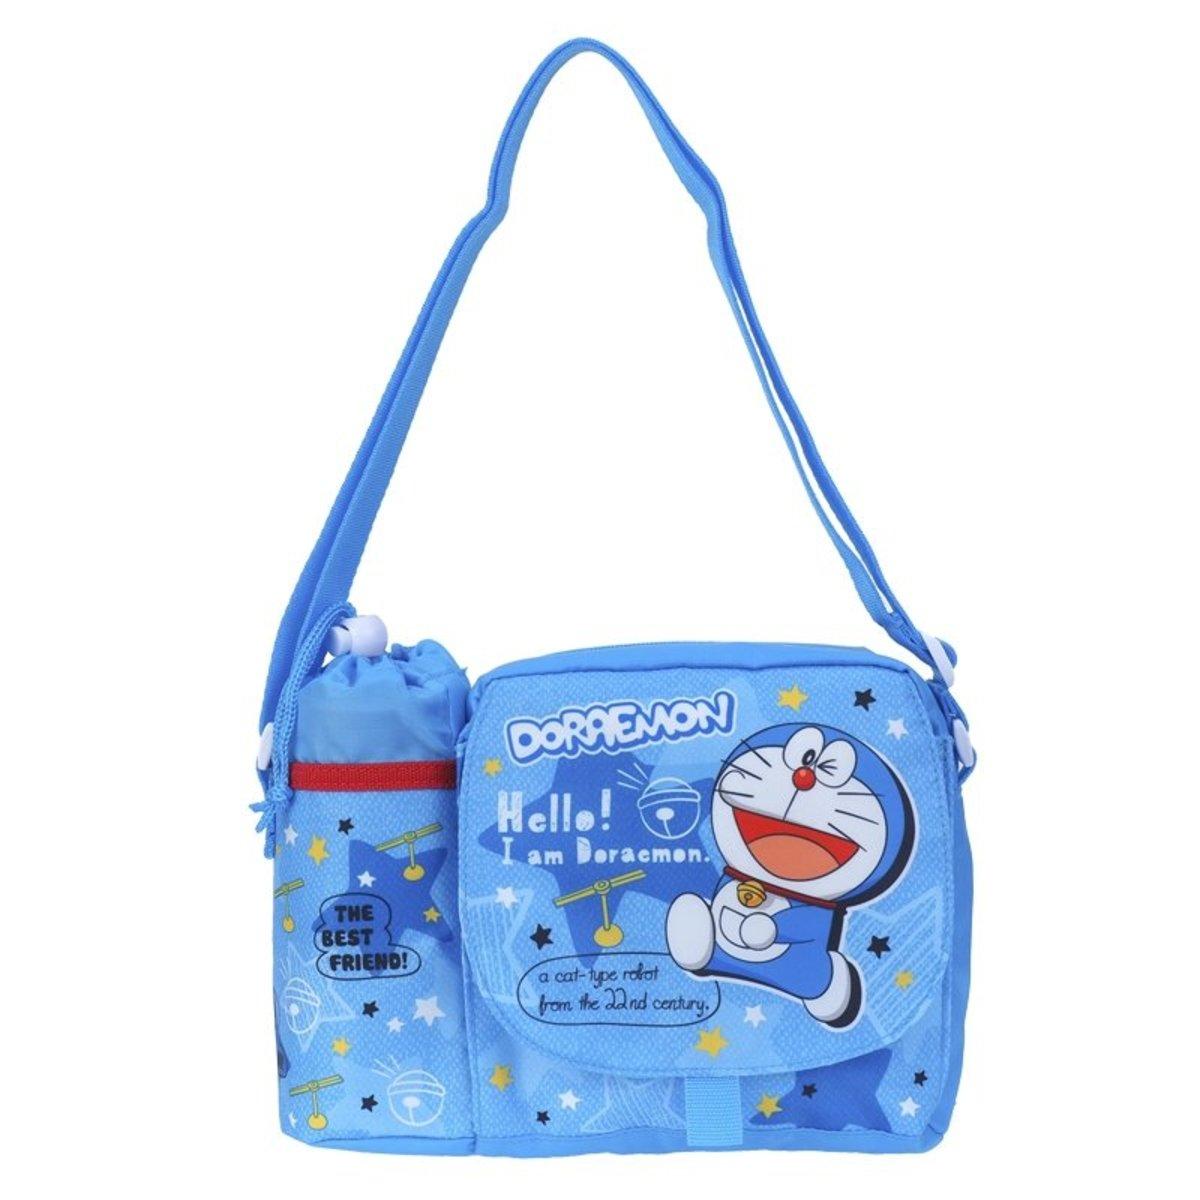 Doraemon 小童斜揹袋連水樽格